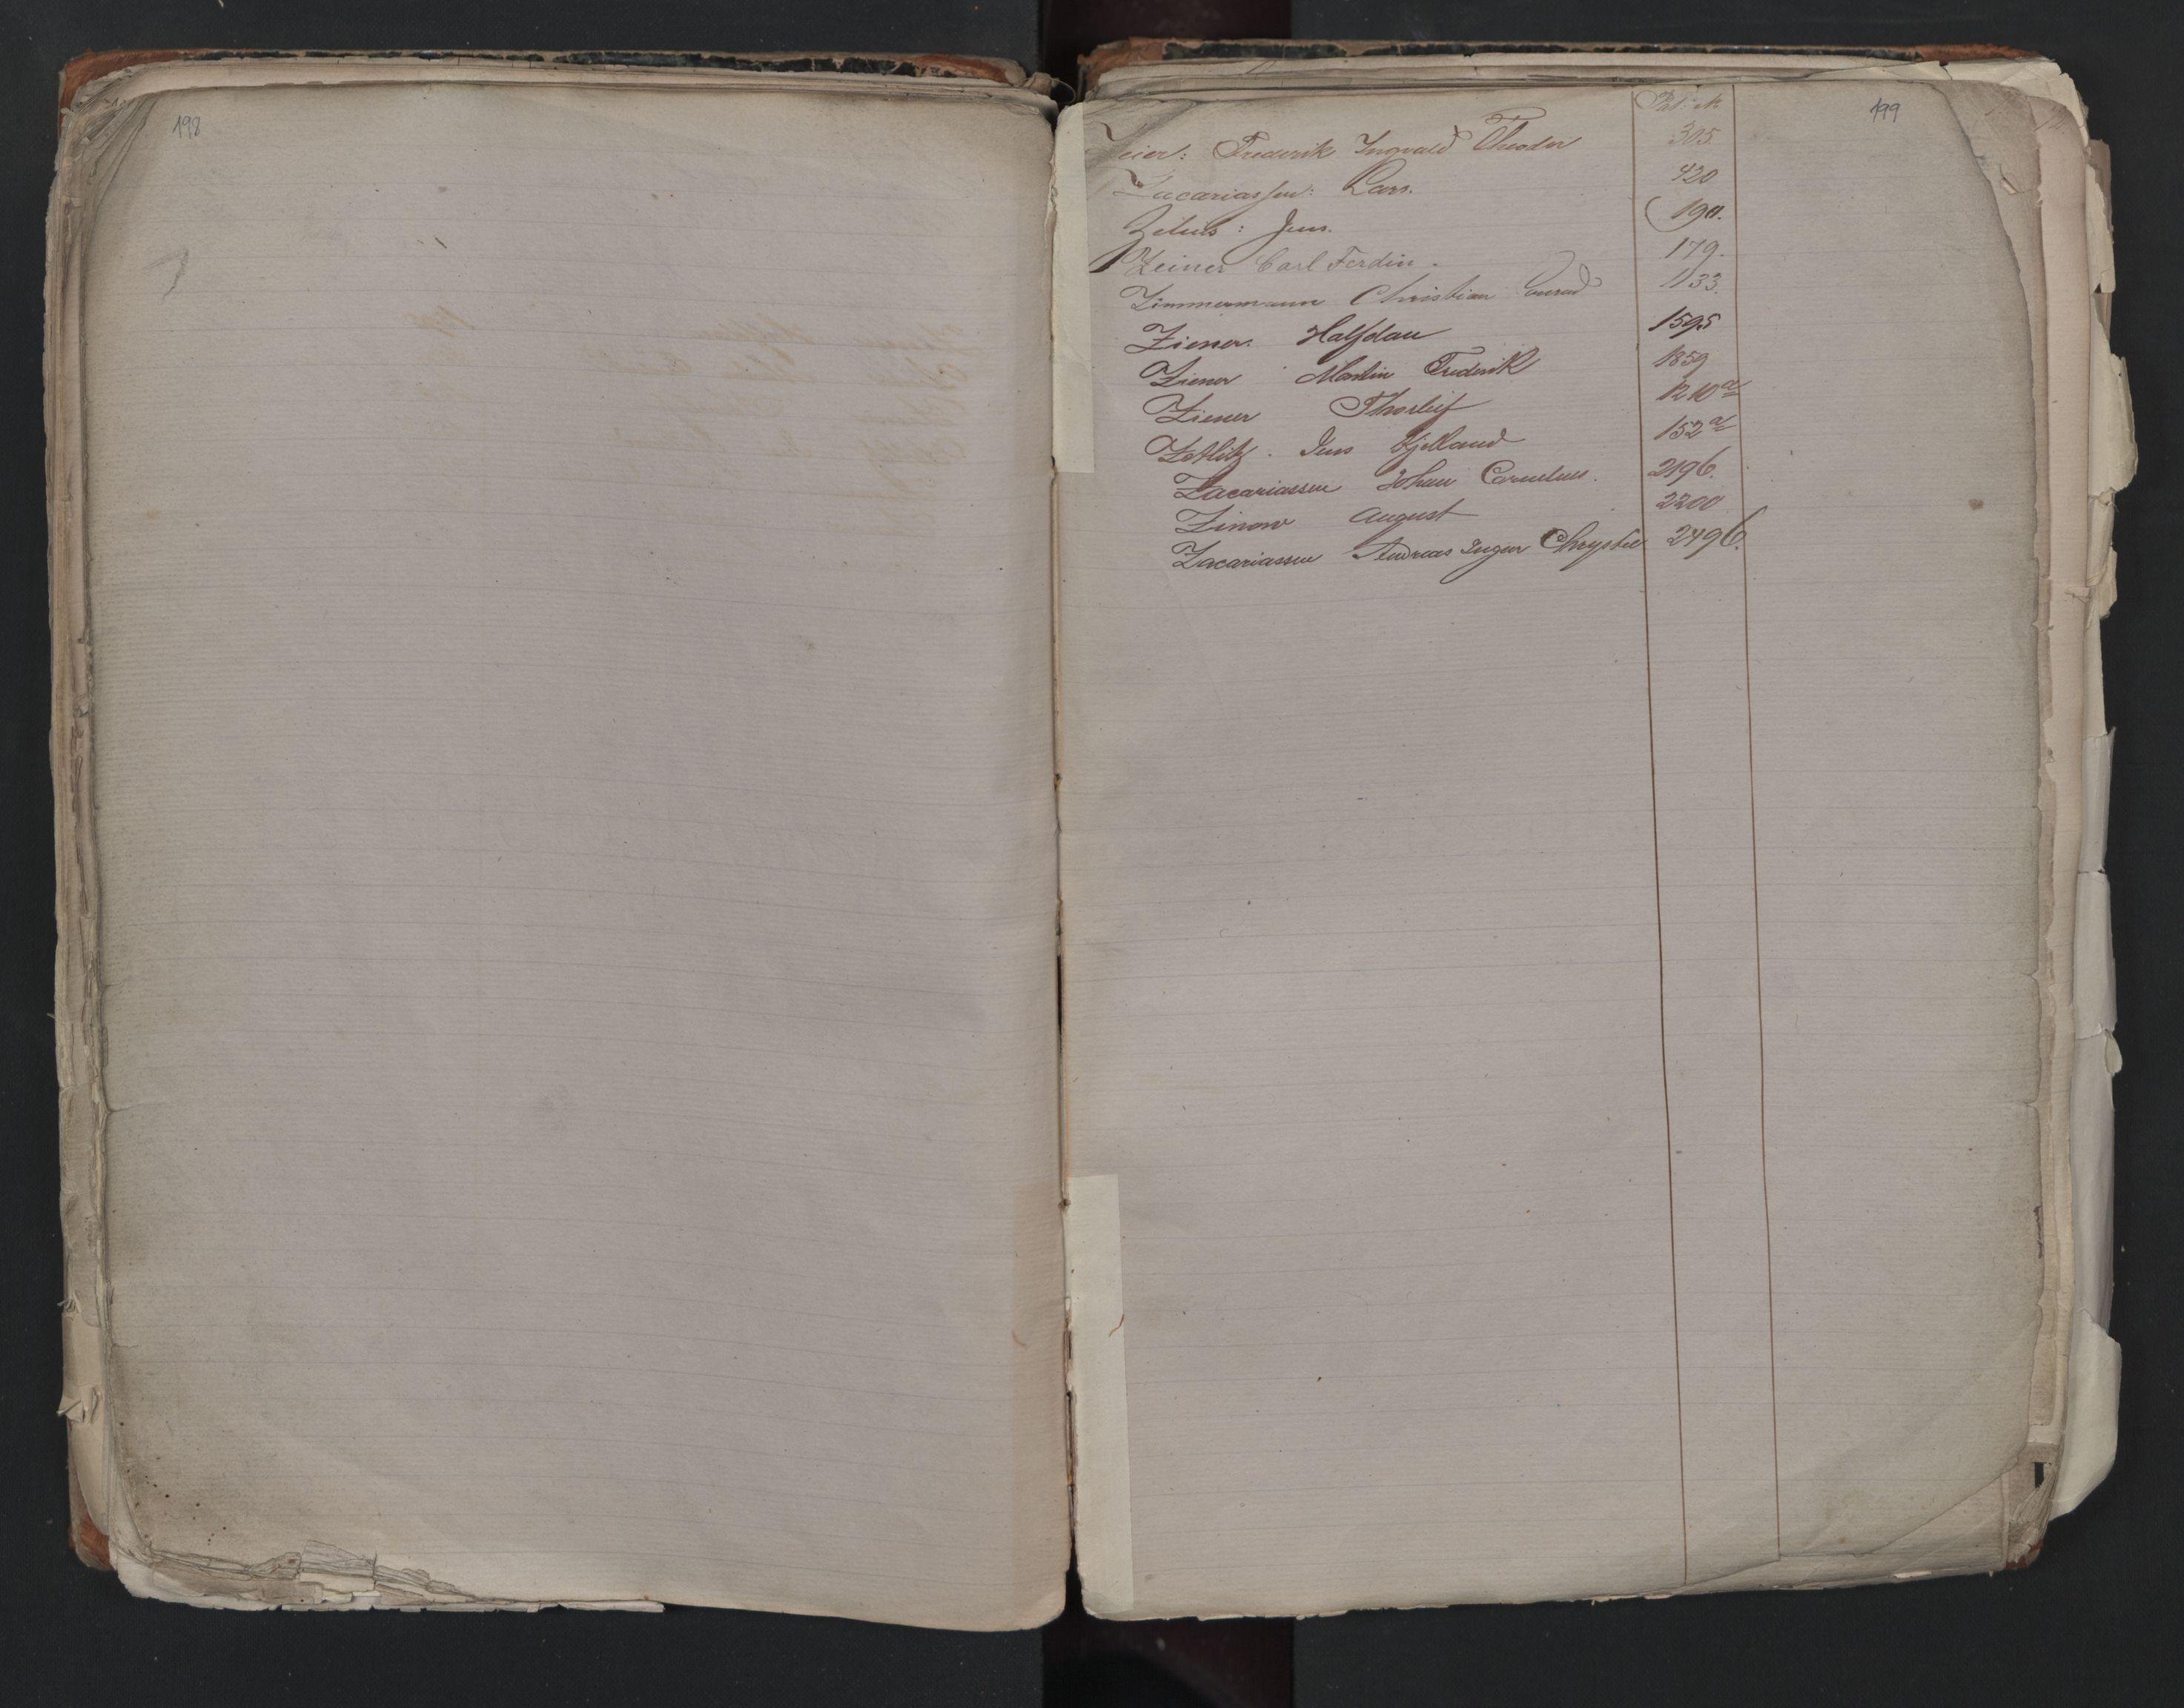 SAO, Oslo sjømannskontor, F/Fa/L0001: Register for Kristiania krets, 1866-1891, s. 198-199